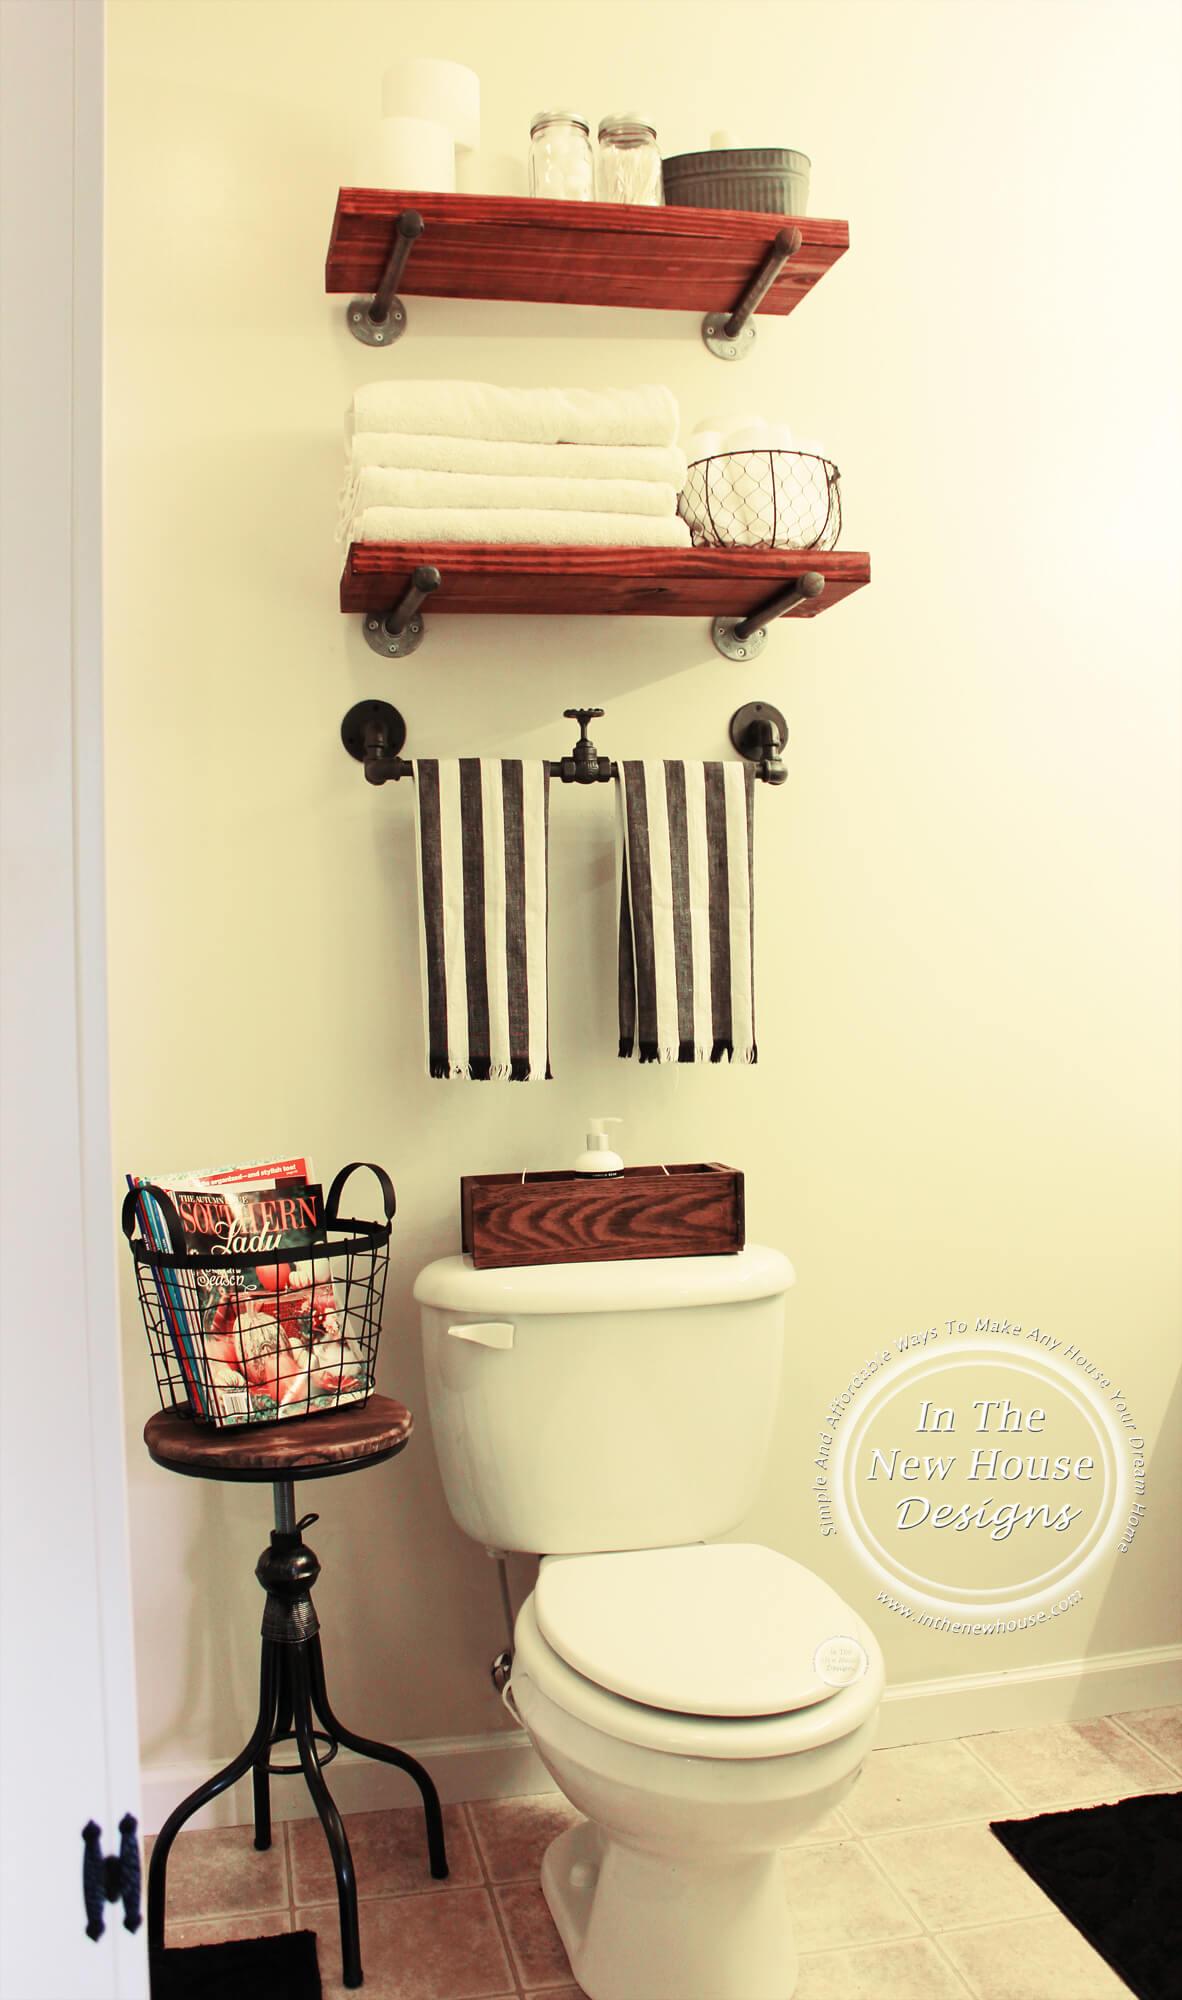 Modern Industrial Pipe Bathroom Shelf and Rack